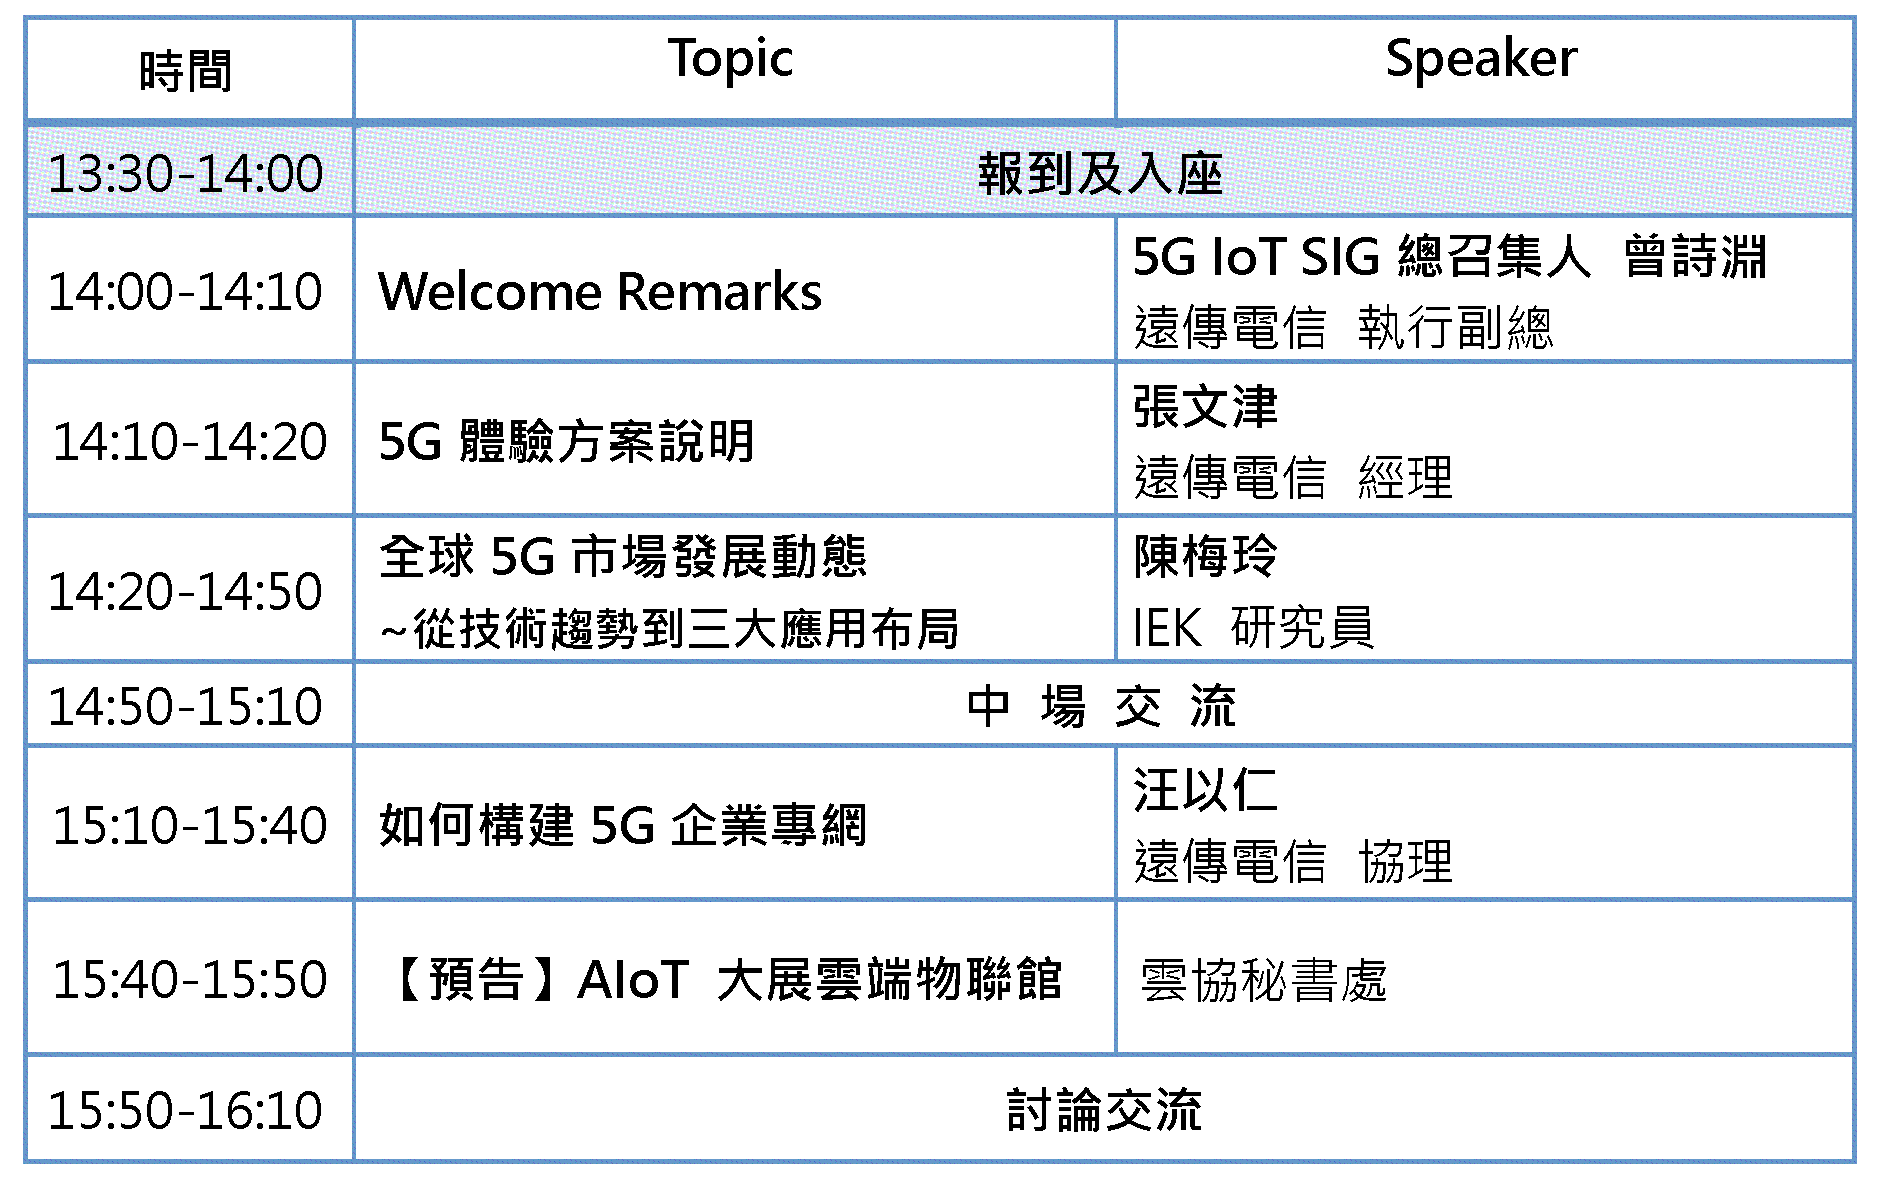 9/20【5G IoT SIG】Workshop 「迎接新局~5G體驗蓄勢待發」分享會